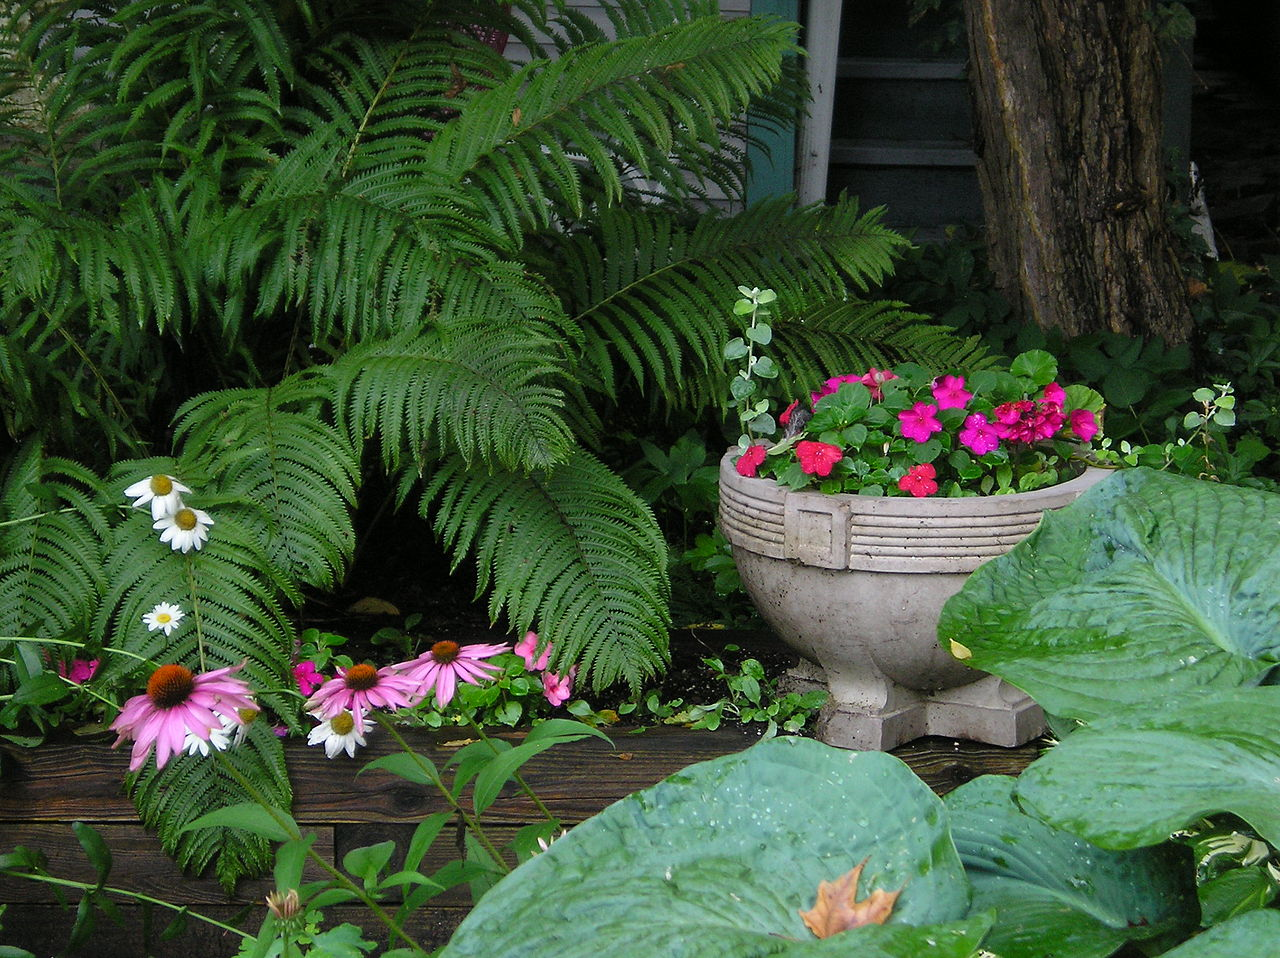 1280px-Shade_garden,_Chautauqua.jpg